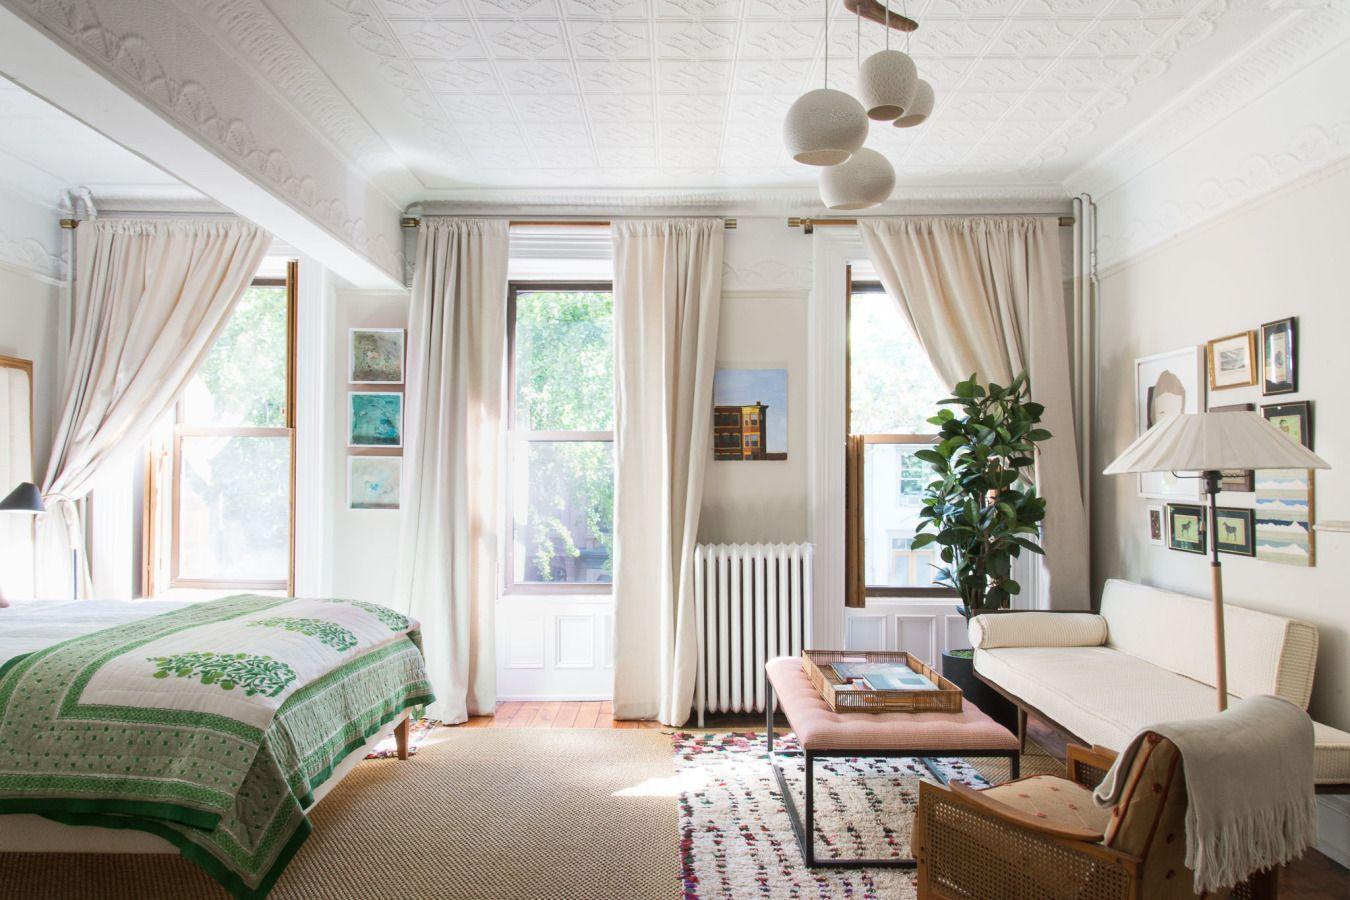 Our Designer S Brooklyn Brownstone Dream Interiors Home Decor Styles Brooklyn Brownstone Home Decor Hacks